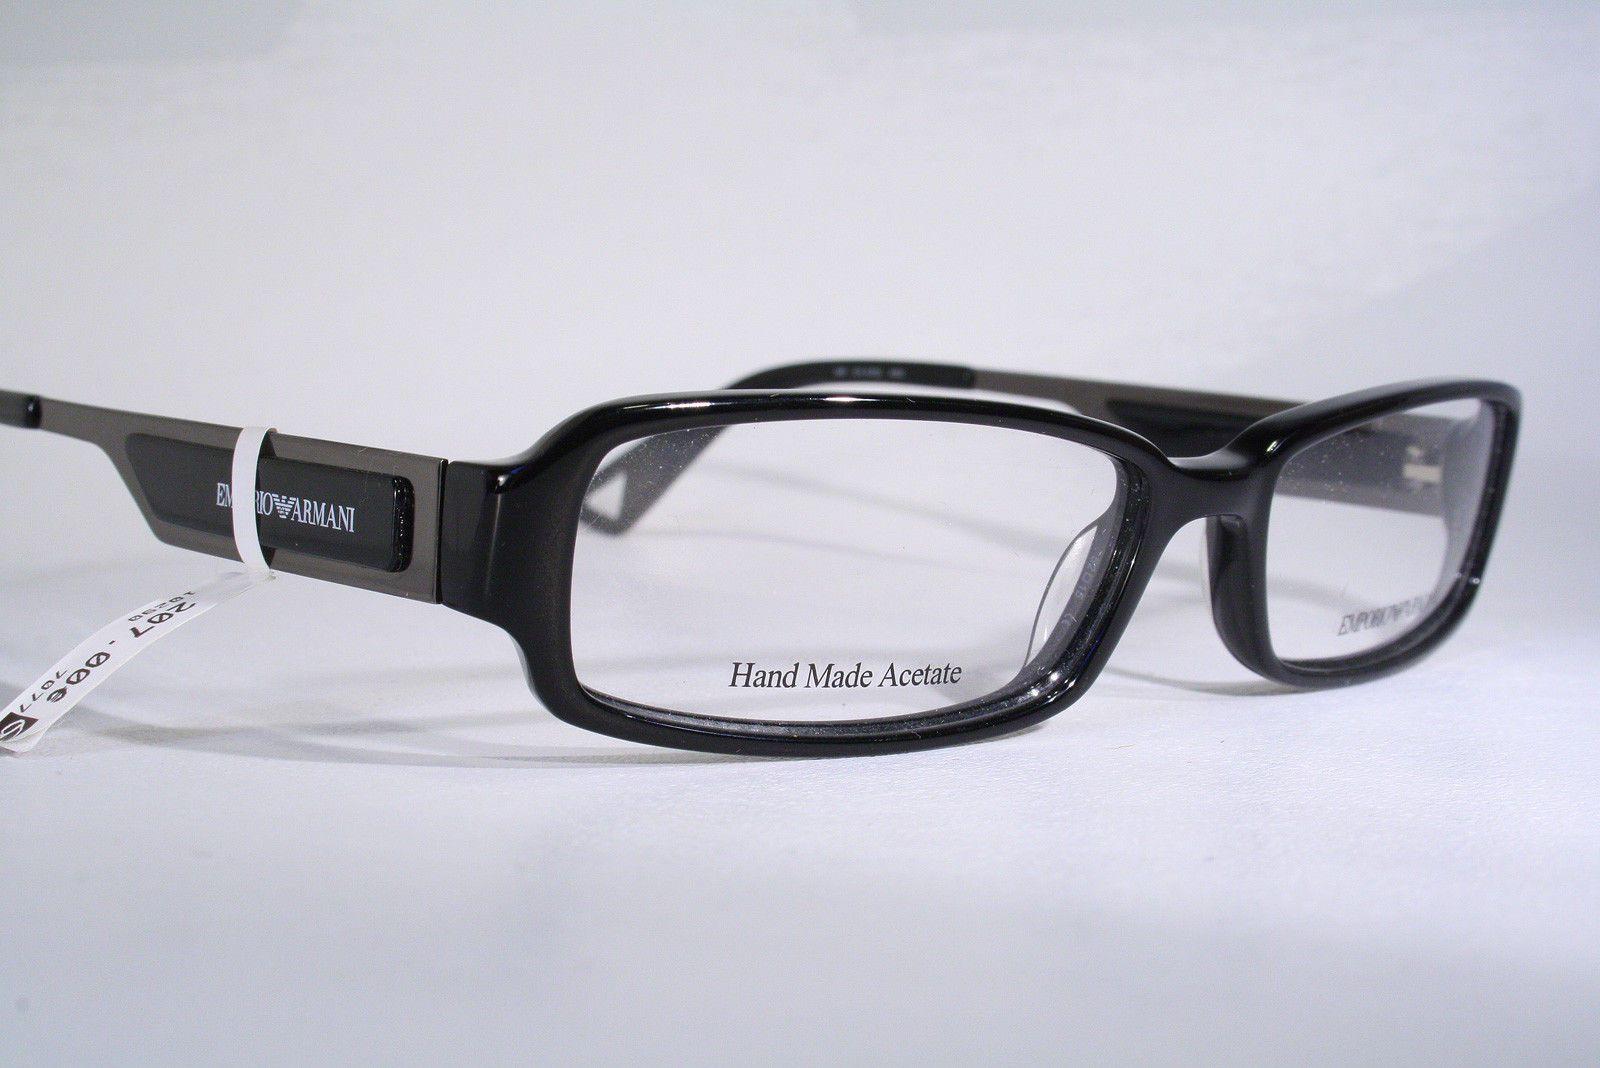 723ba394c1 EMPORIO ARMANI New Women s Black Rectangular Eyeglass Frames Glasses  Readers